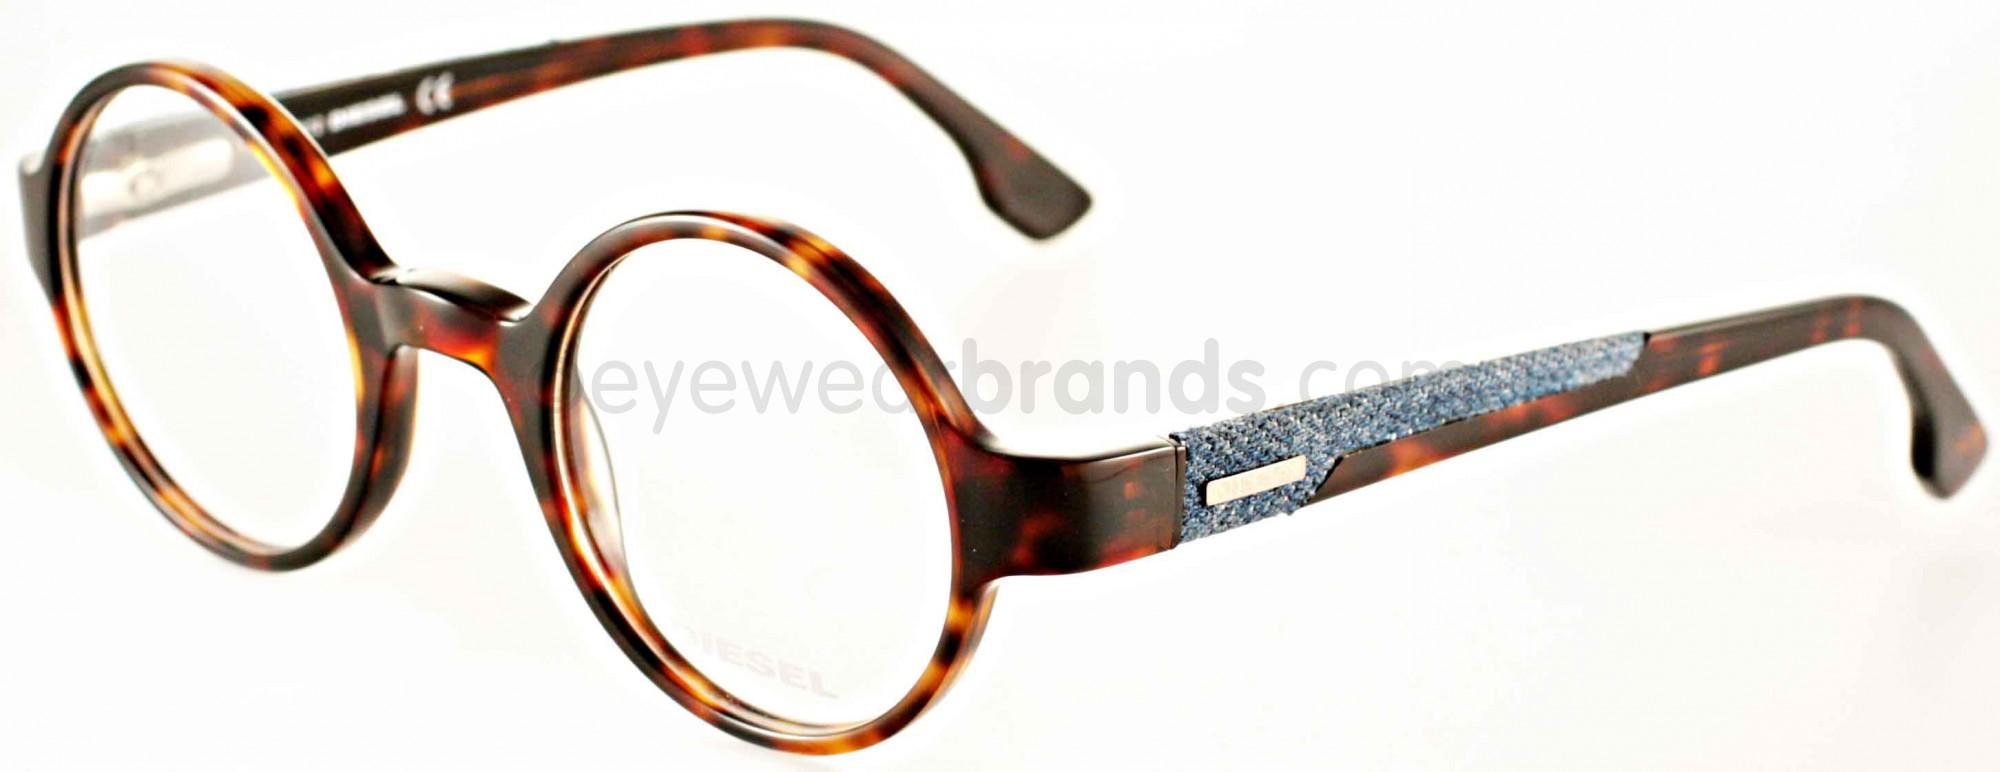 diesel denimize eyewear collection eyewear brands